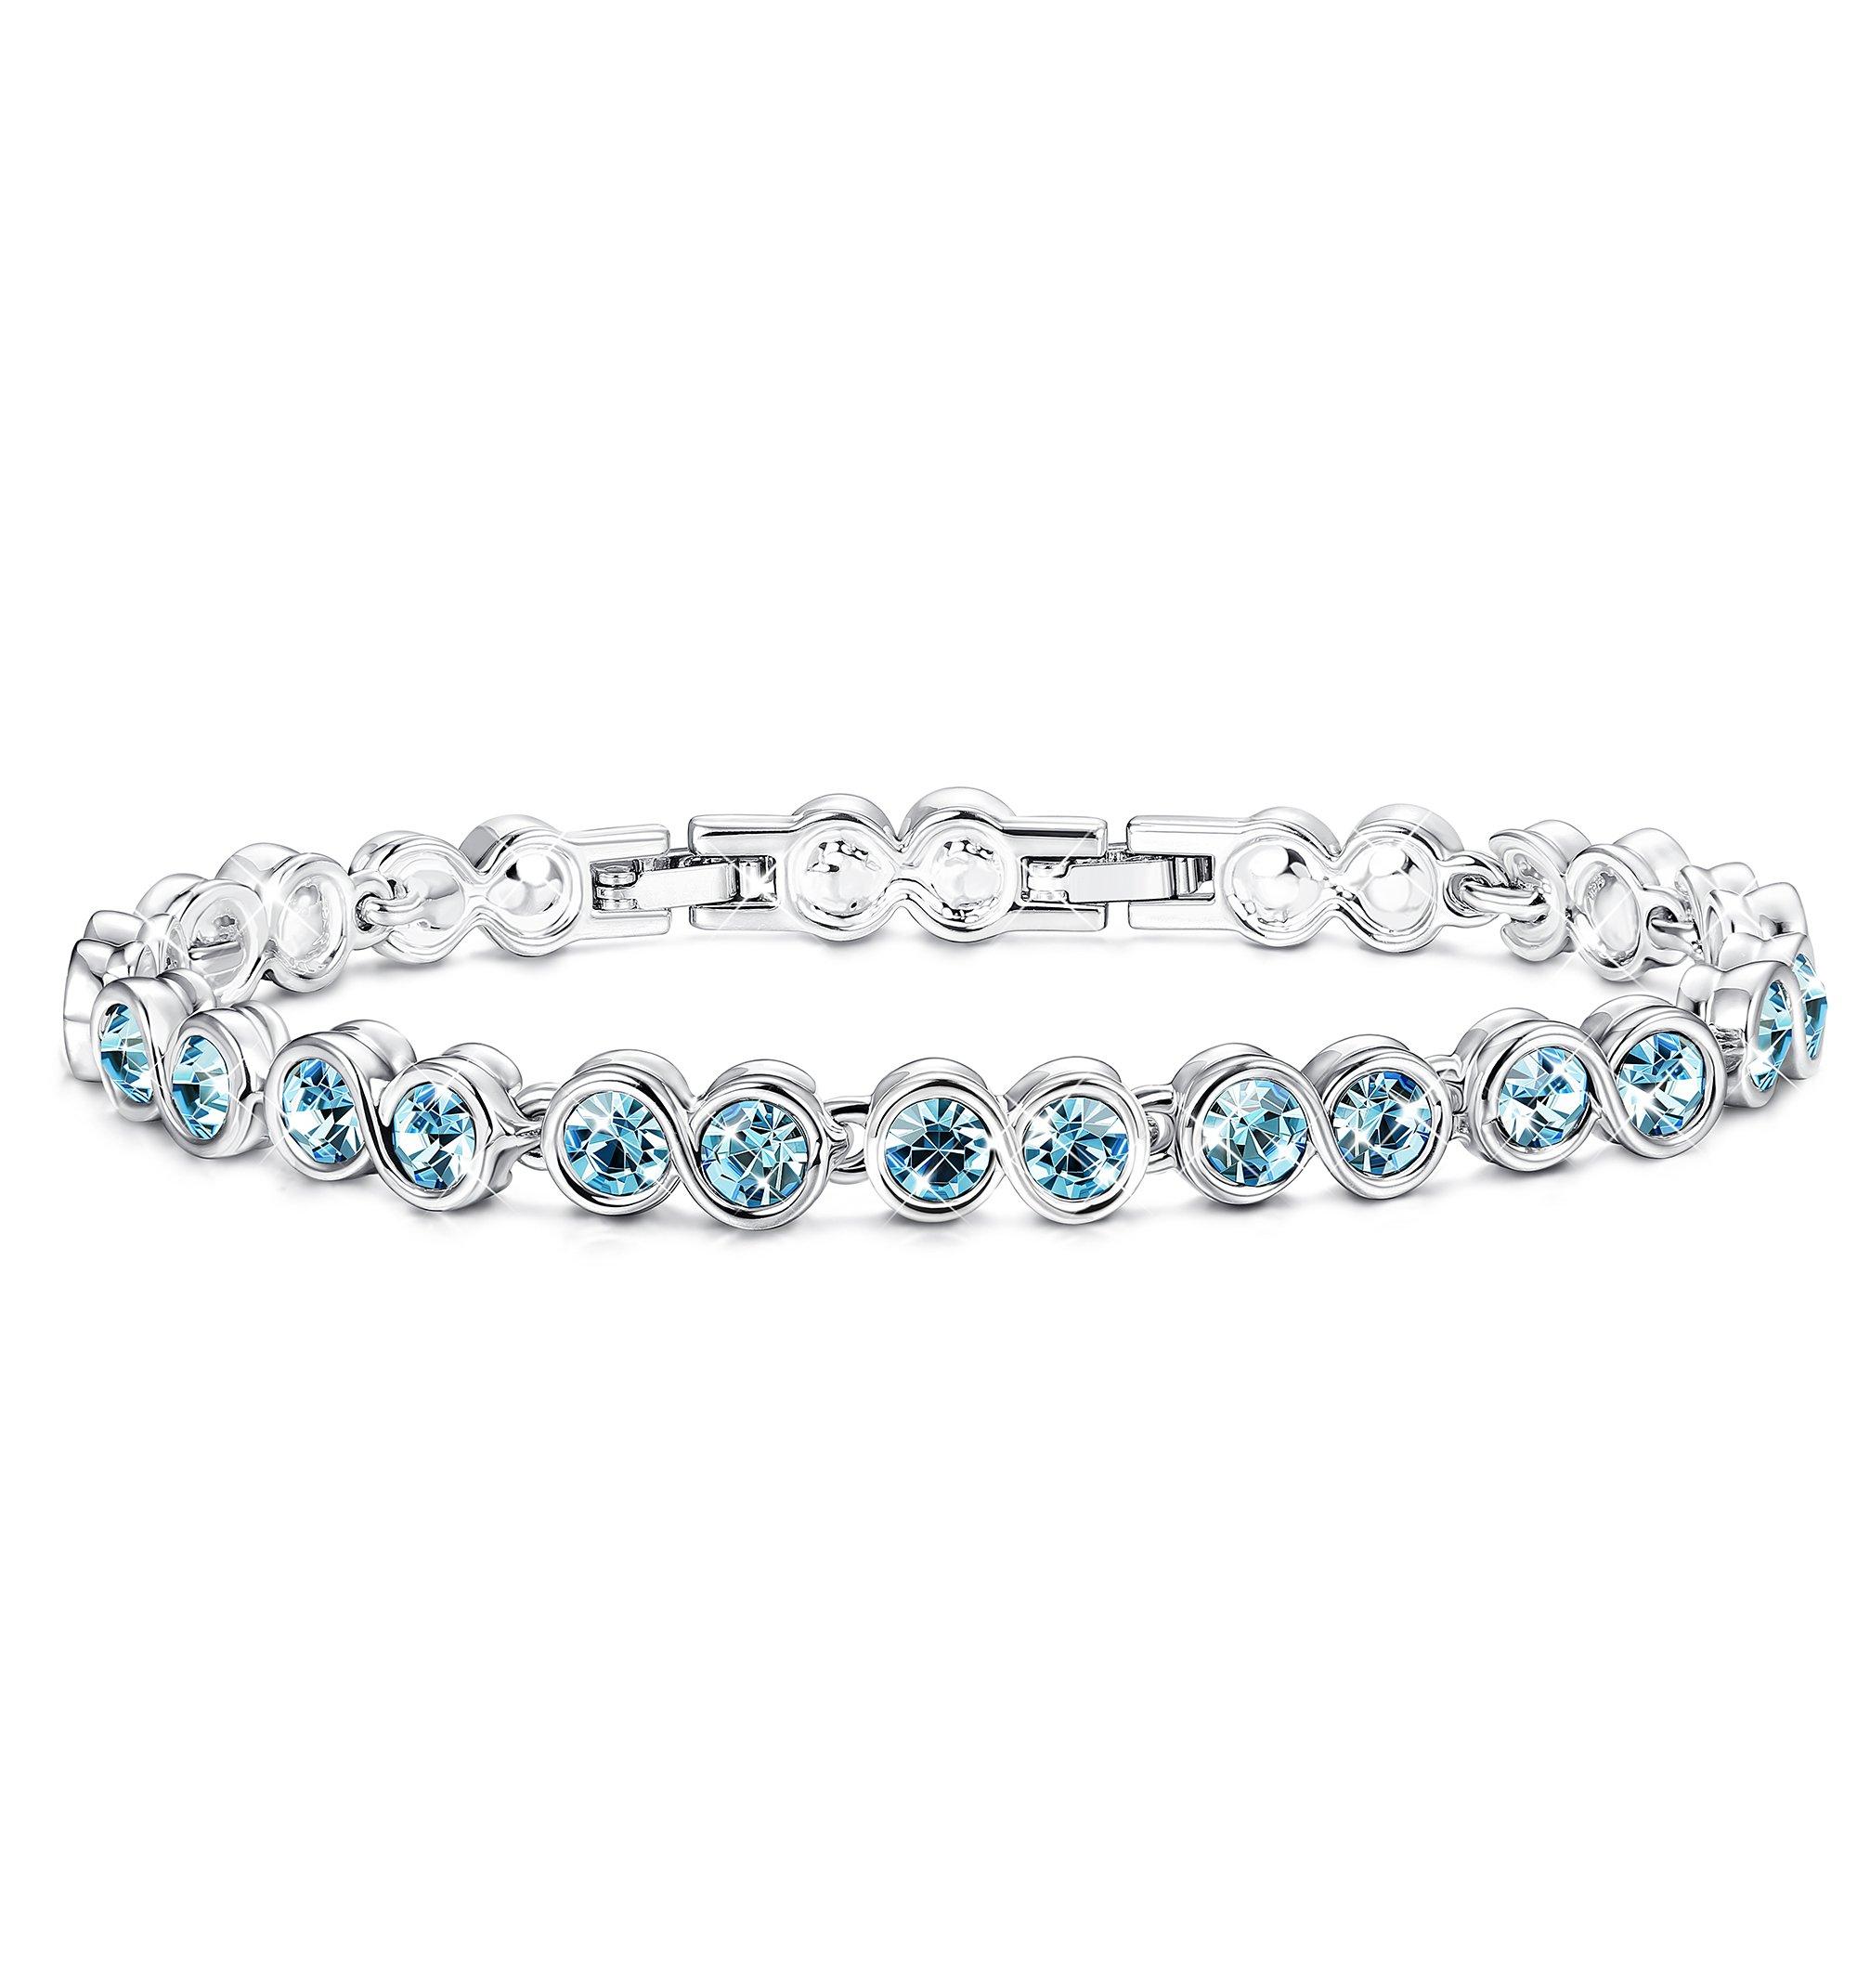 Sllaiss Swarovski Crystal Bracelet Blue Tennis Infinity Jewelry Women Gift Girlfriend(Blue Crystal Bracelet)